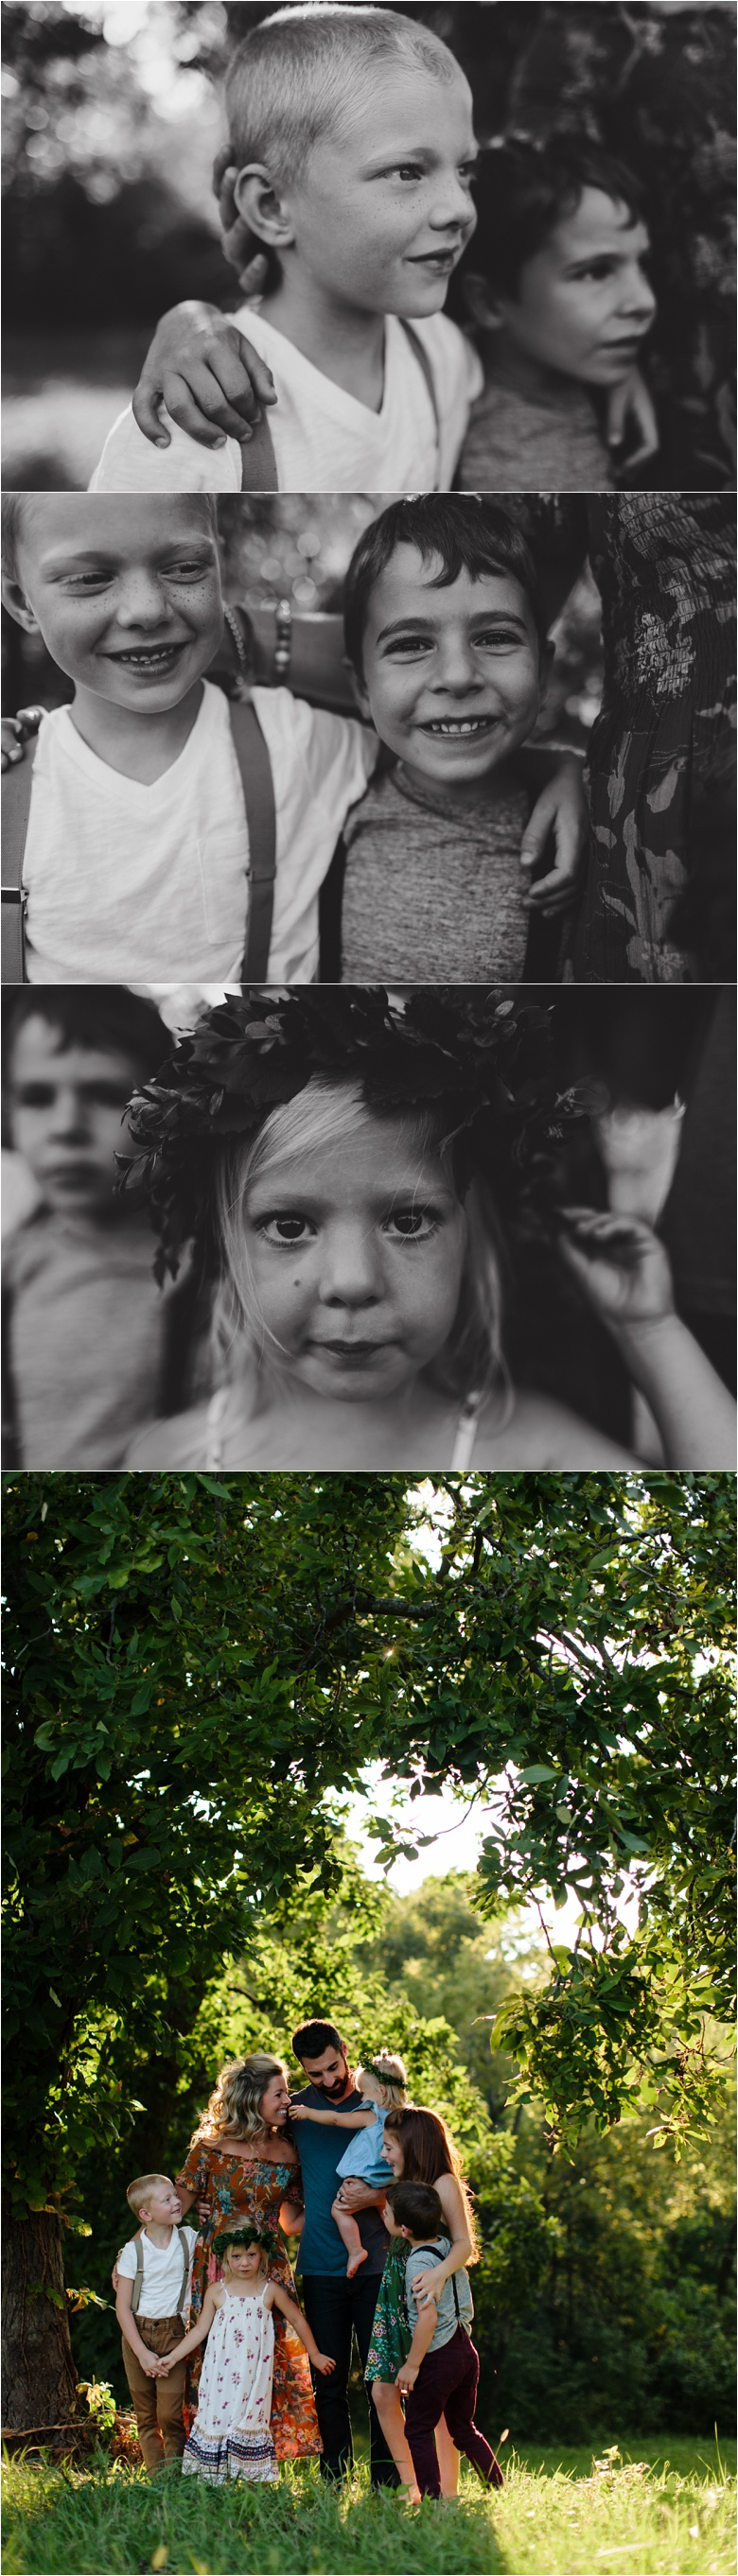 wildflowersphotos_0001